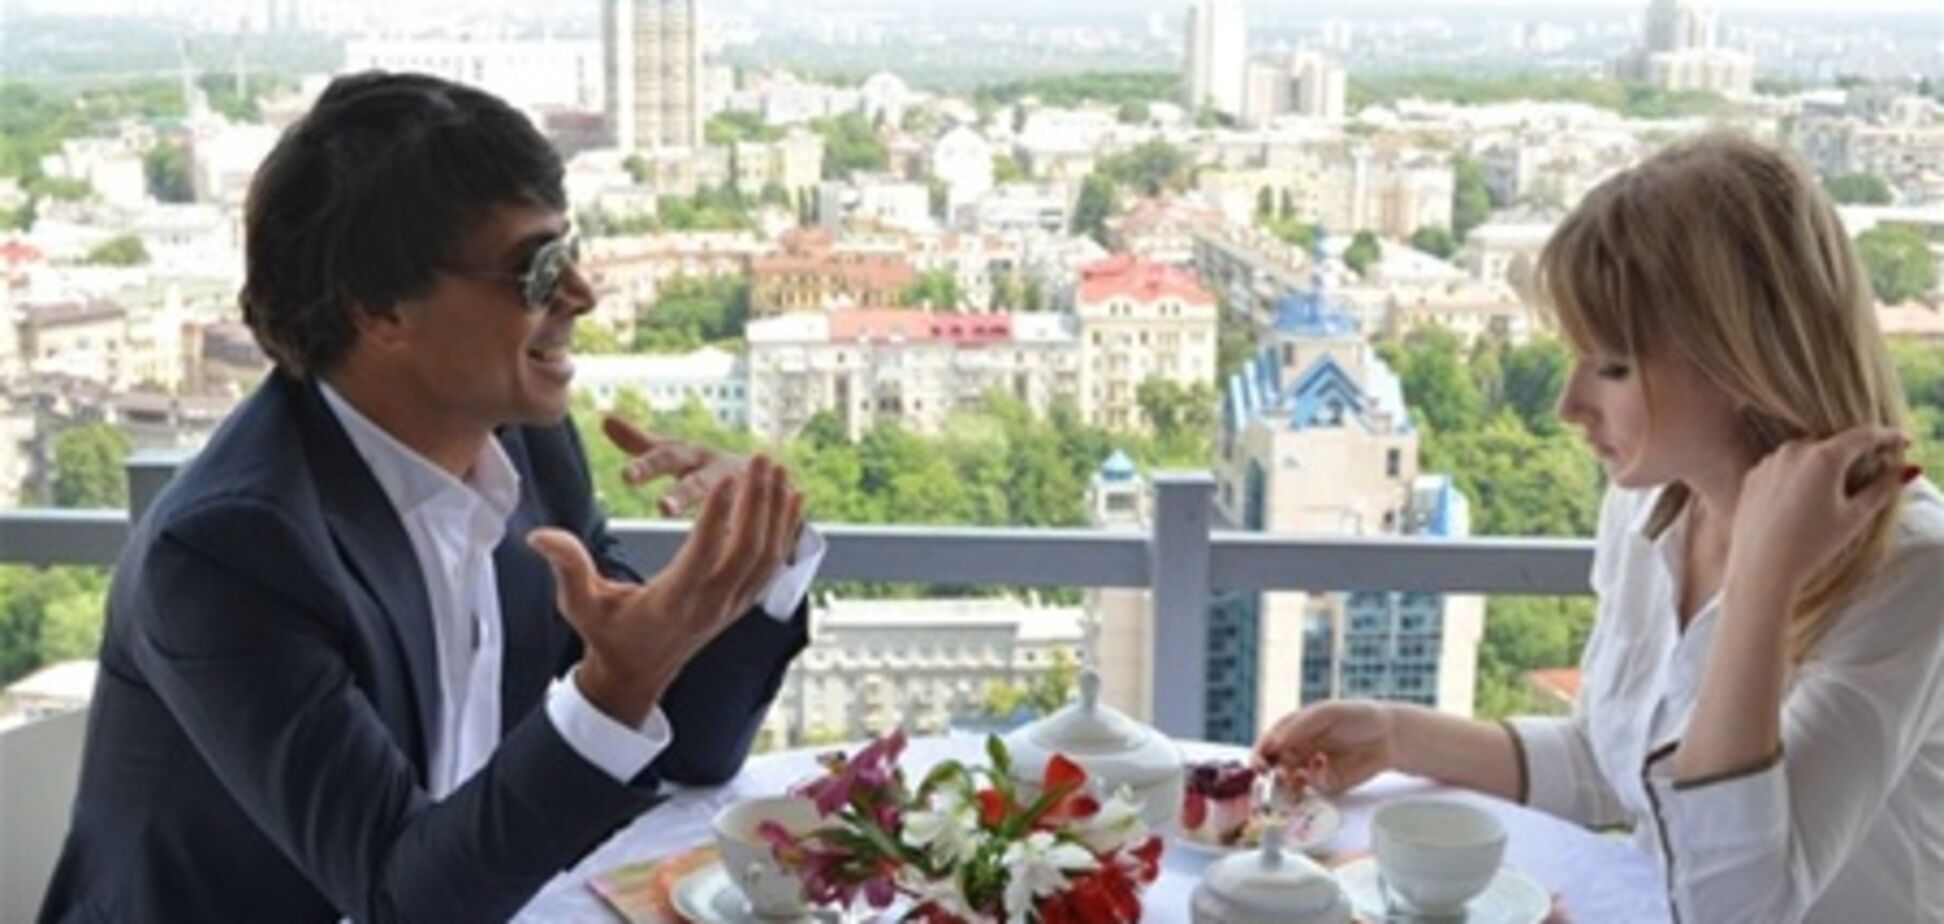 Валид Арфуш за завтраком с Березовской